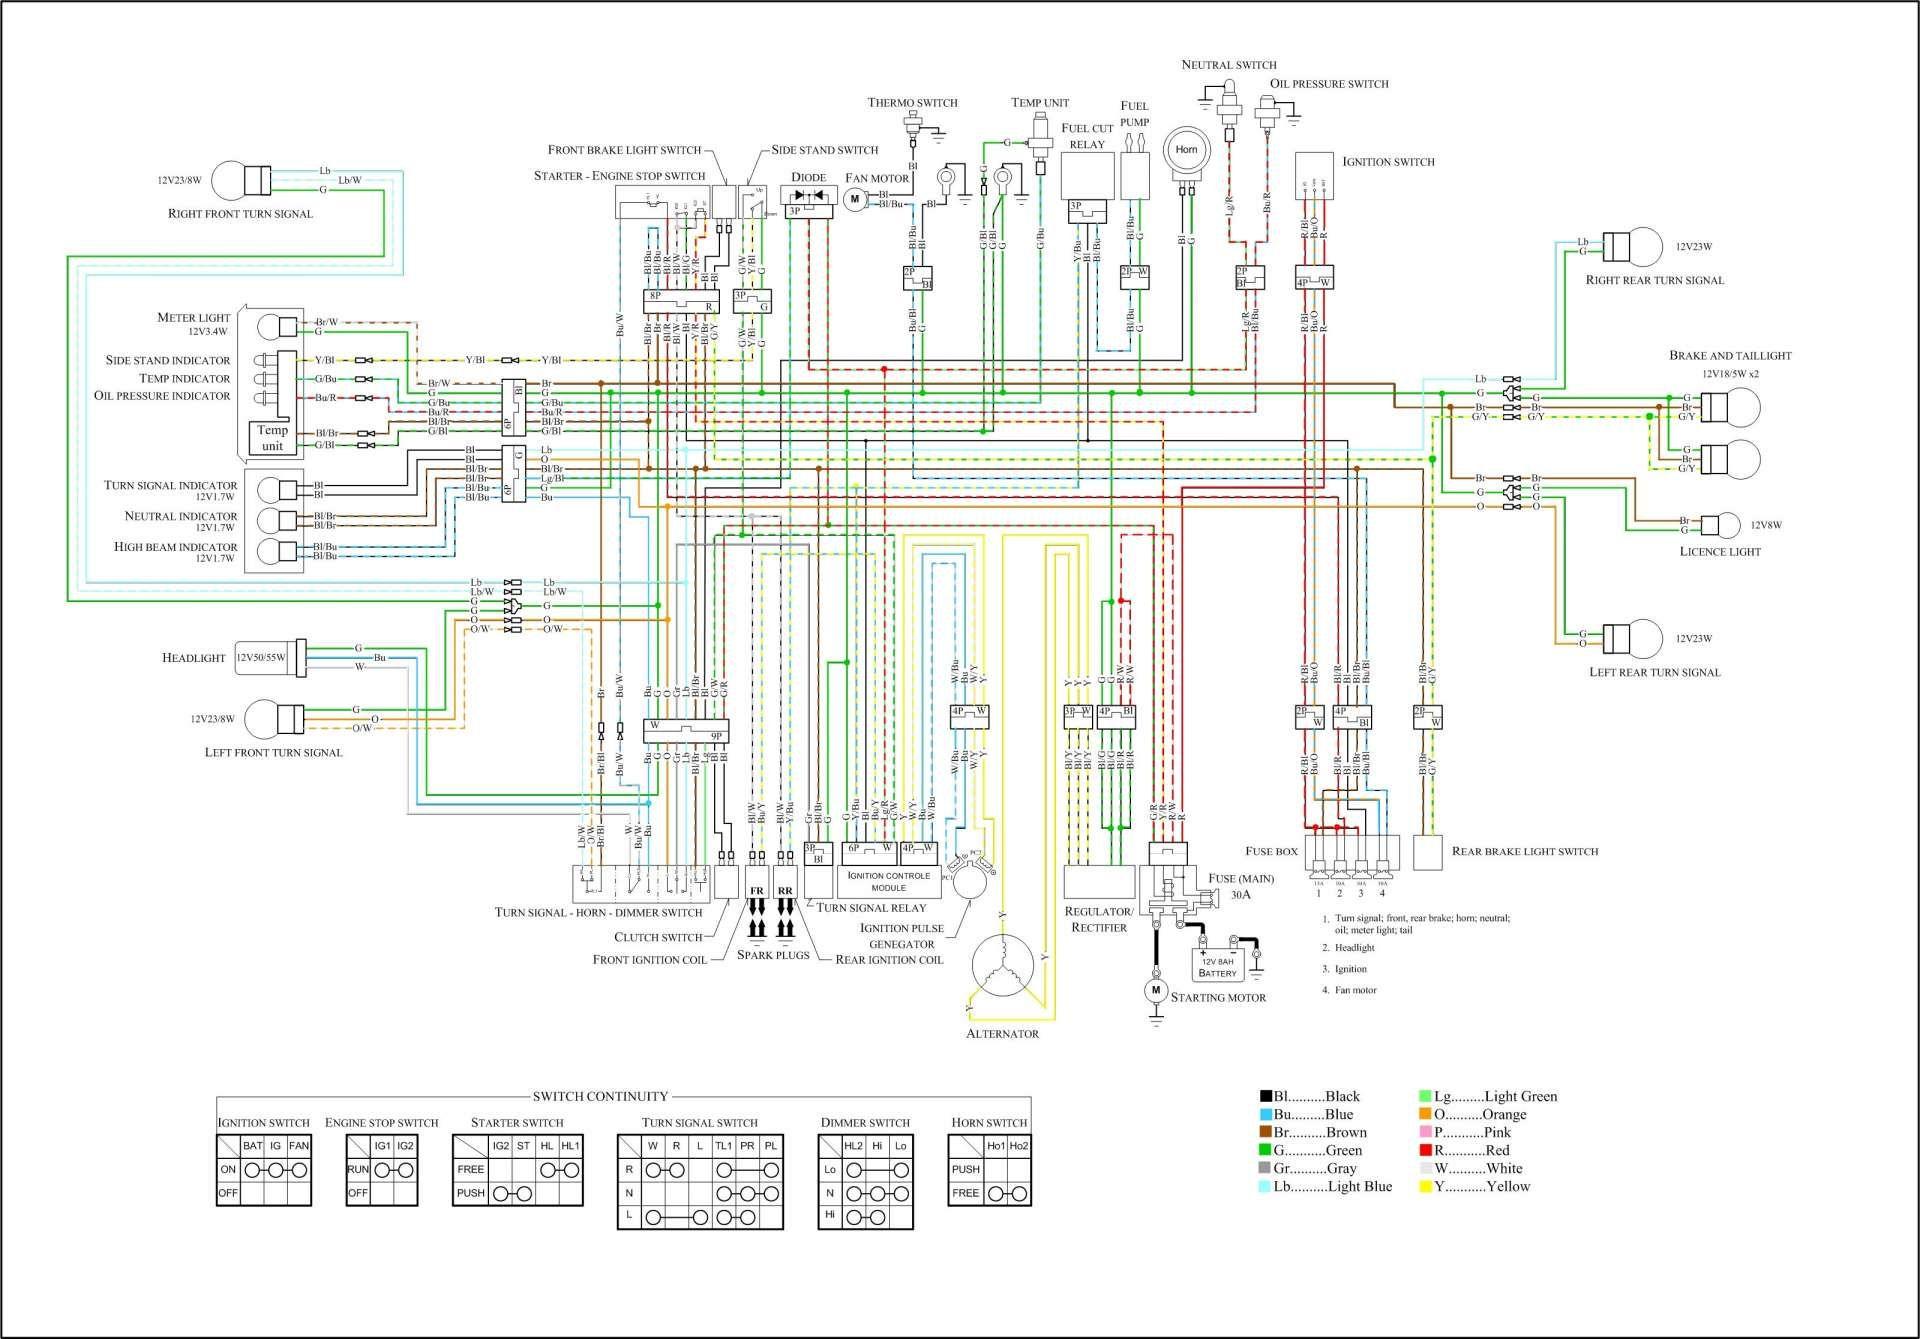 17 Suzuki Motorcycle Wiring Diagram Motorcycle Diagram Wiringg Net Motorcycle Wiring Electrical Diagram Electrical Wiring Diagram